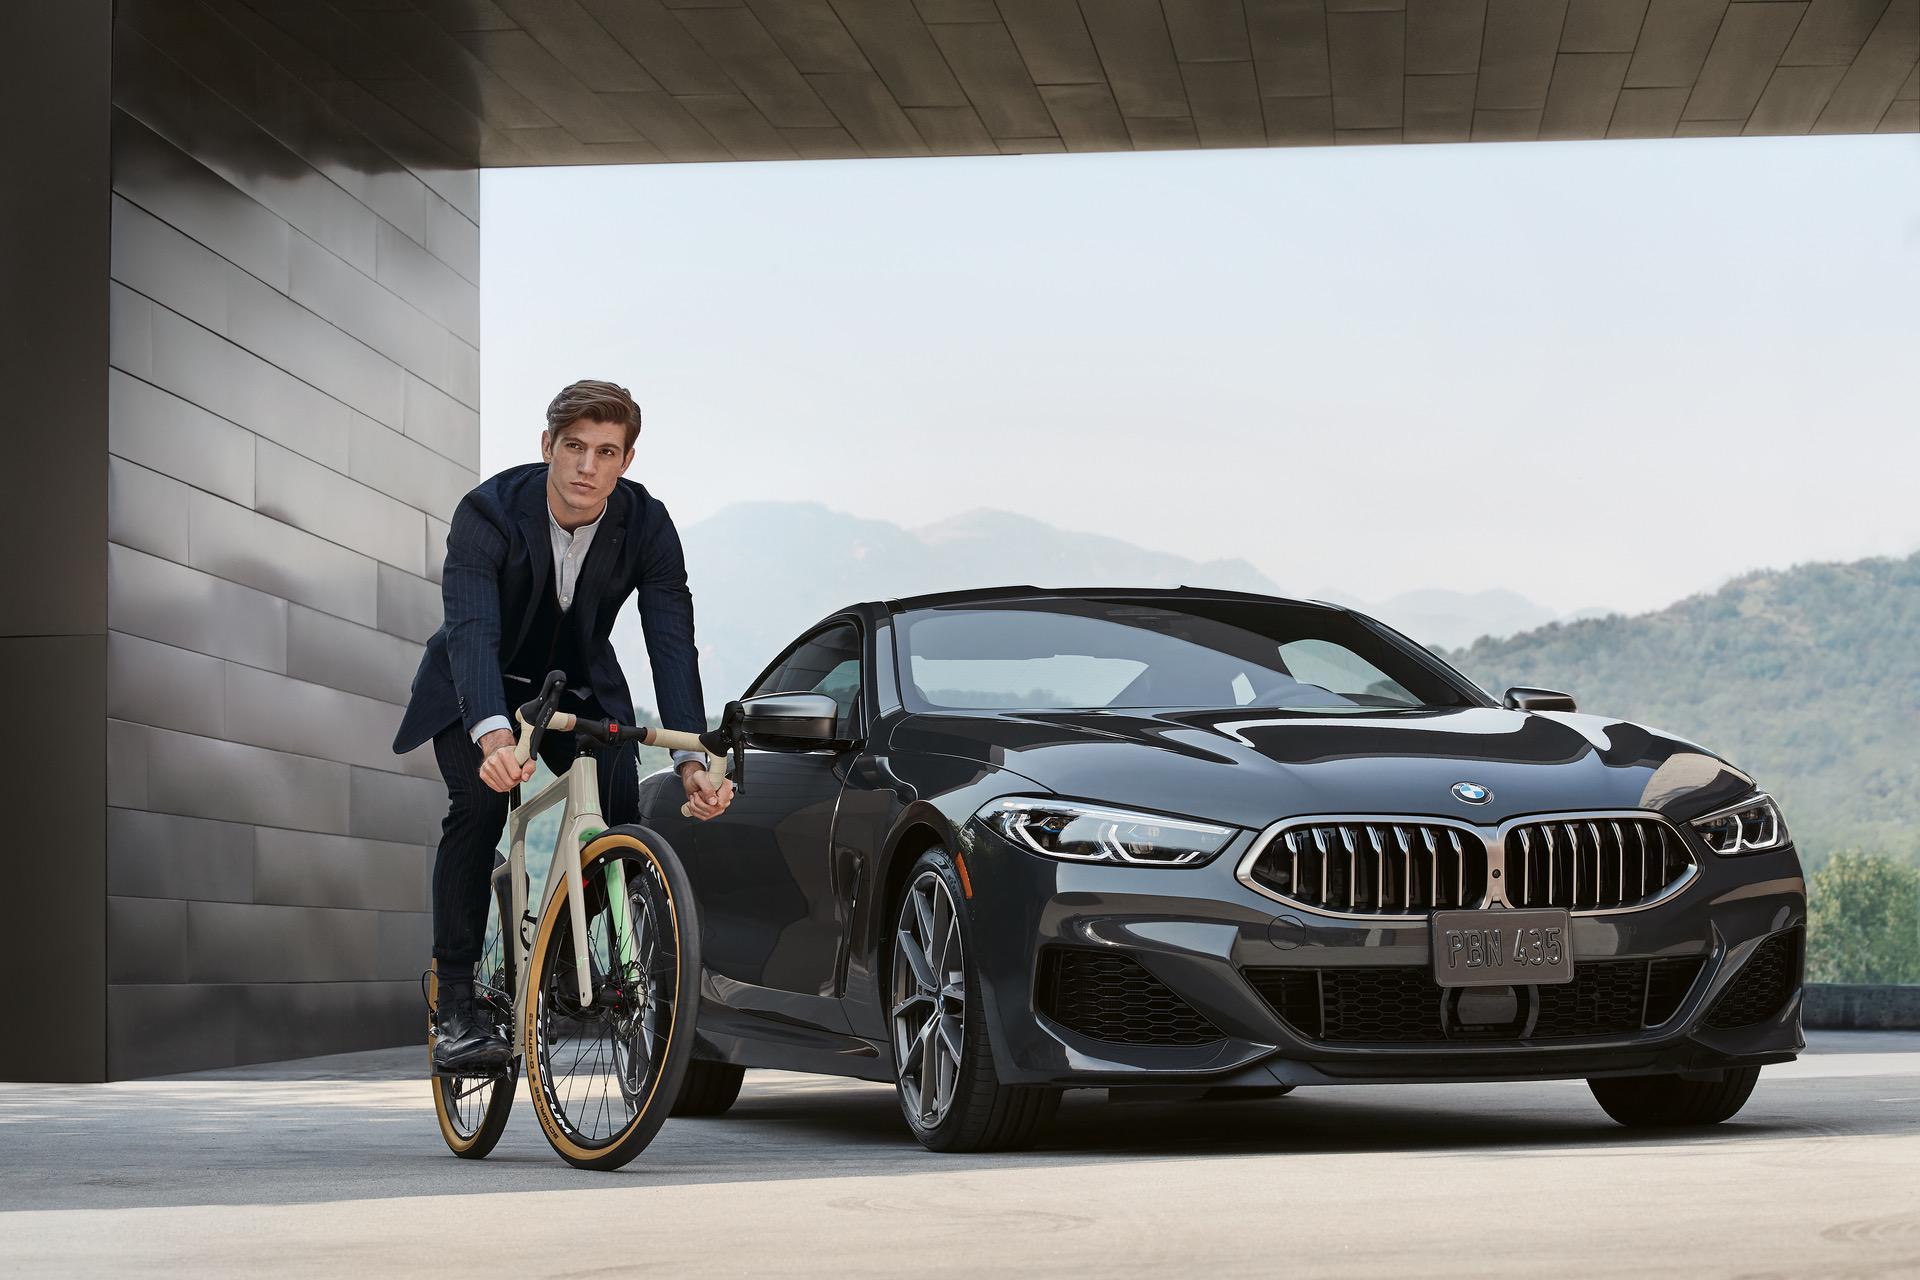 Bike manufacturer 3T and BMW 03